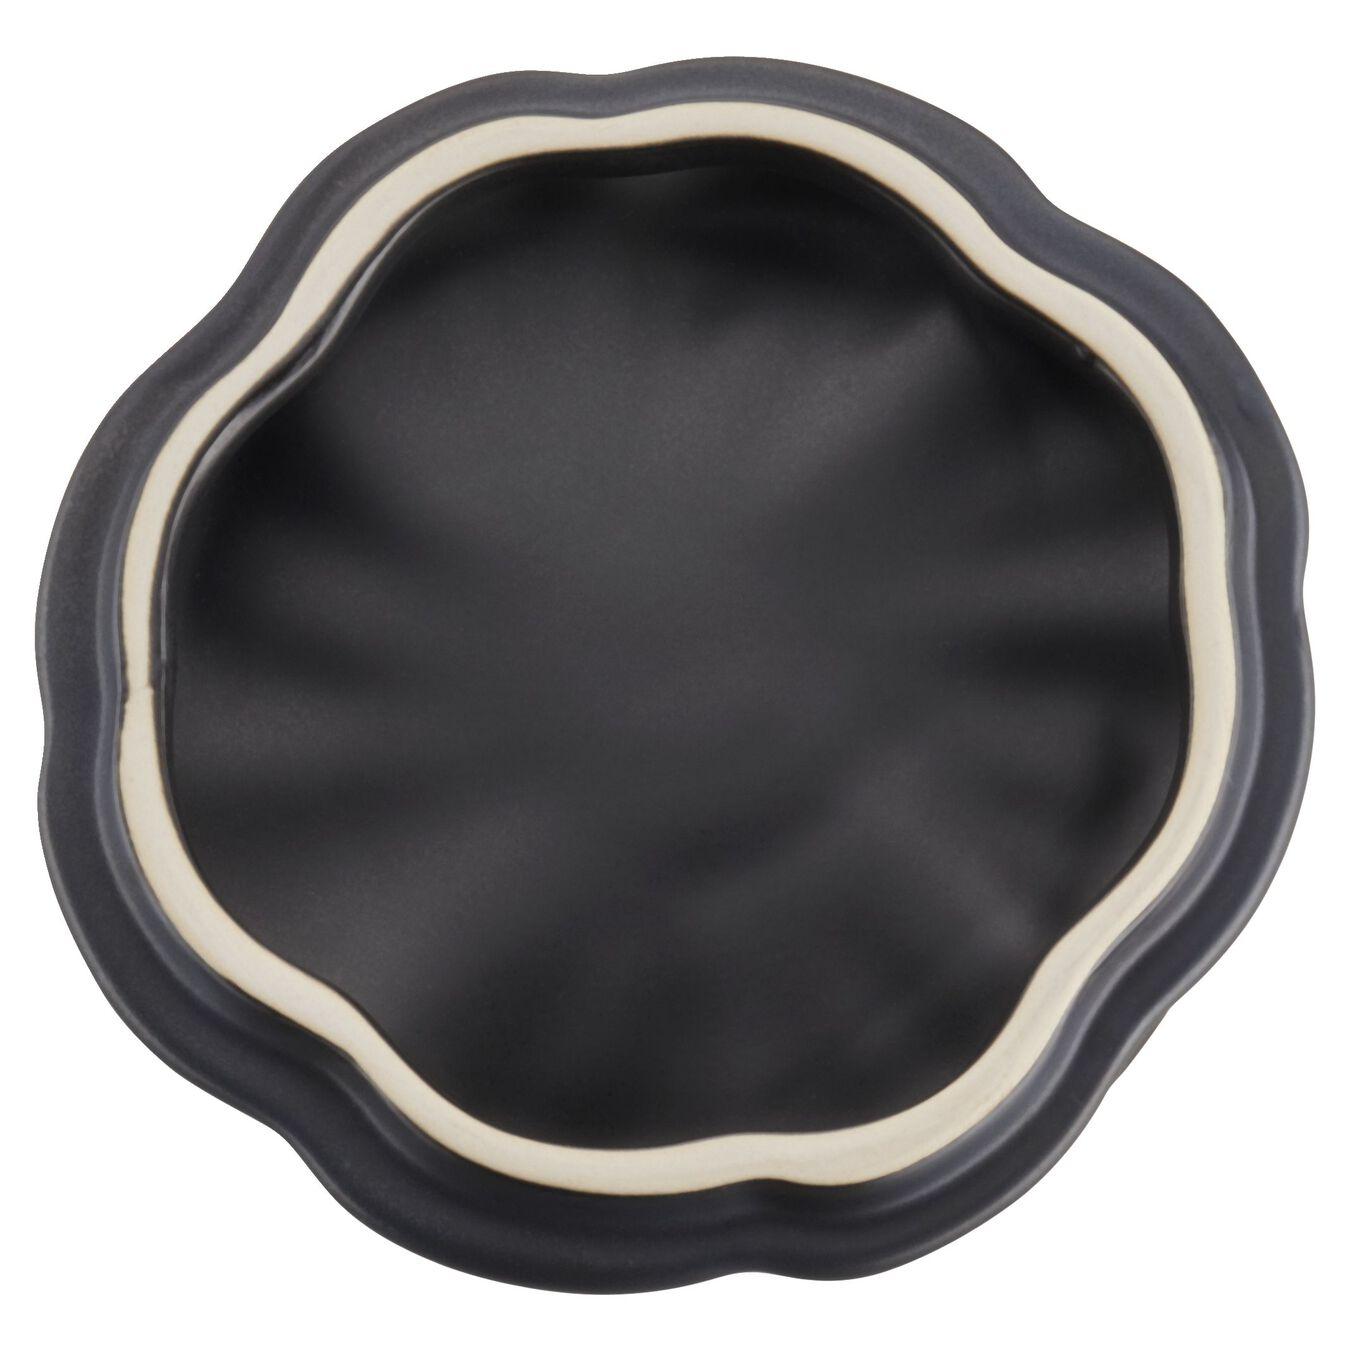 500 ml Ceramic pumpkin Cocotte, Black,,large 10